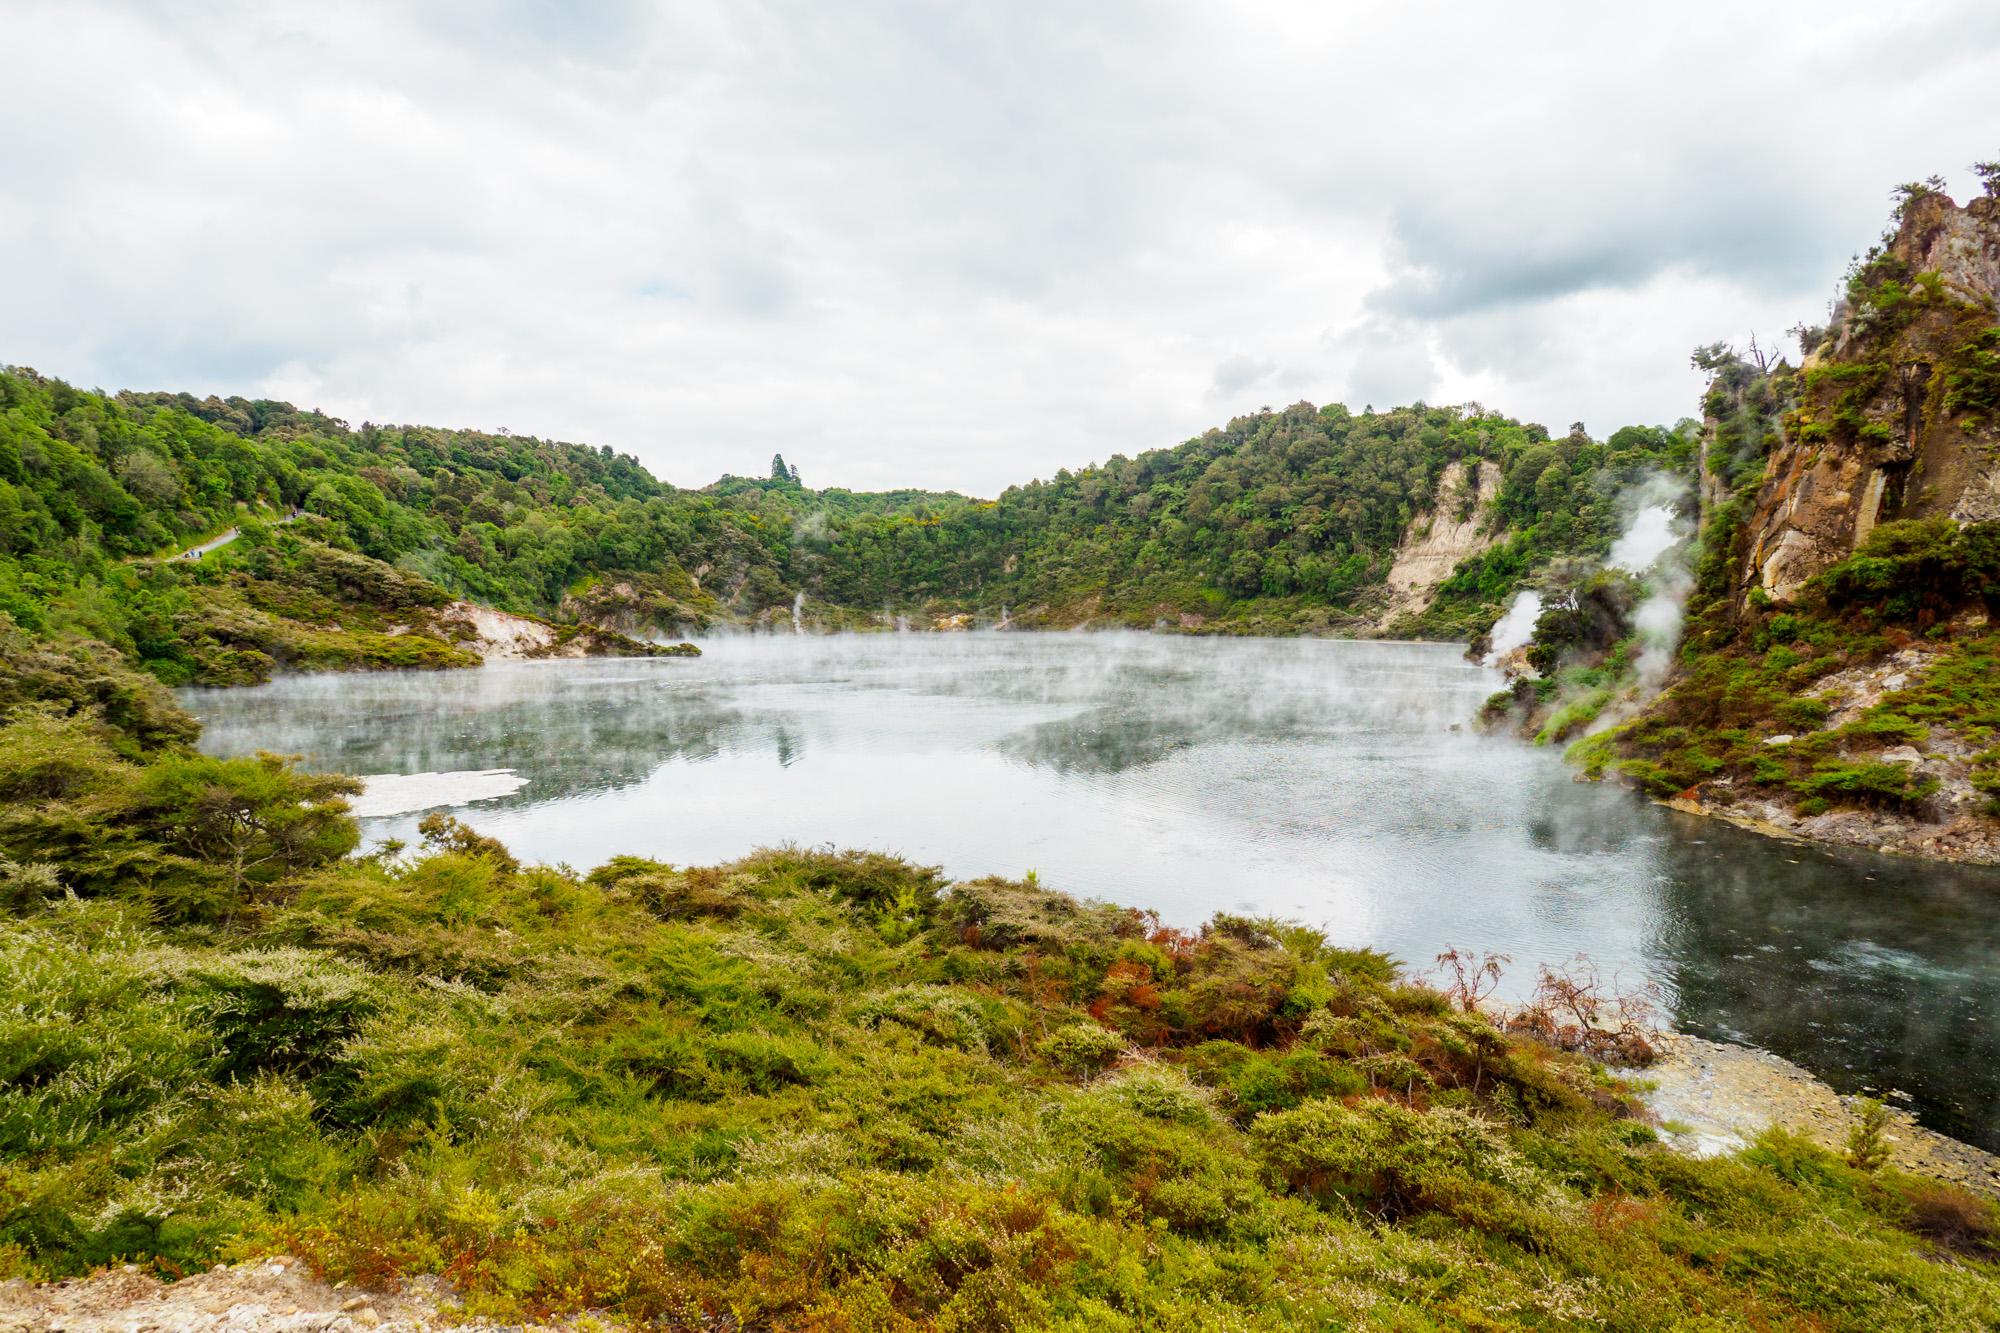 Rotorua und Taupo - Frying Pan Lake im Waimangu Volcanic and Thermal Valley